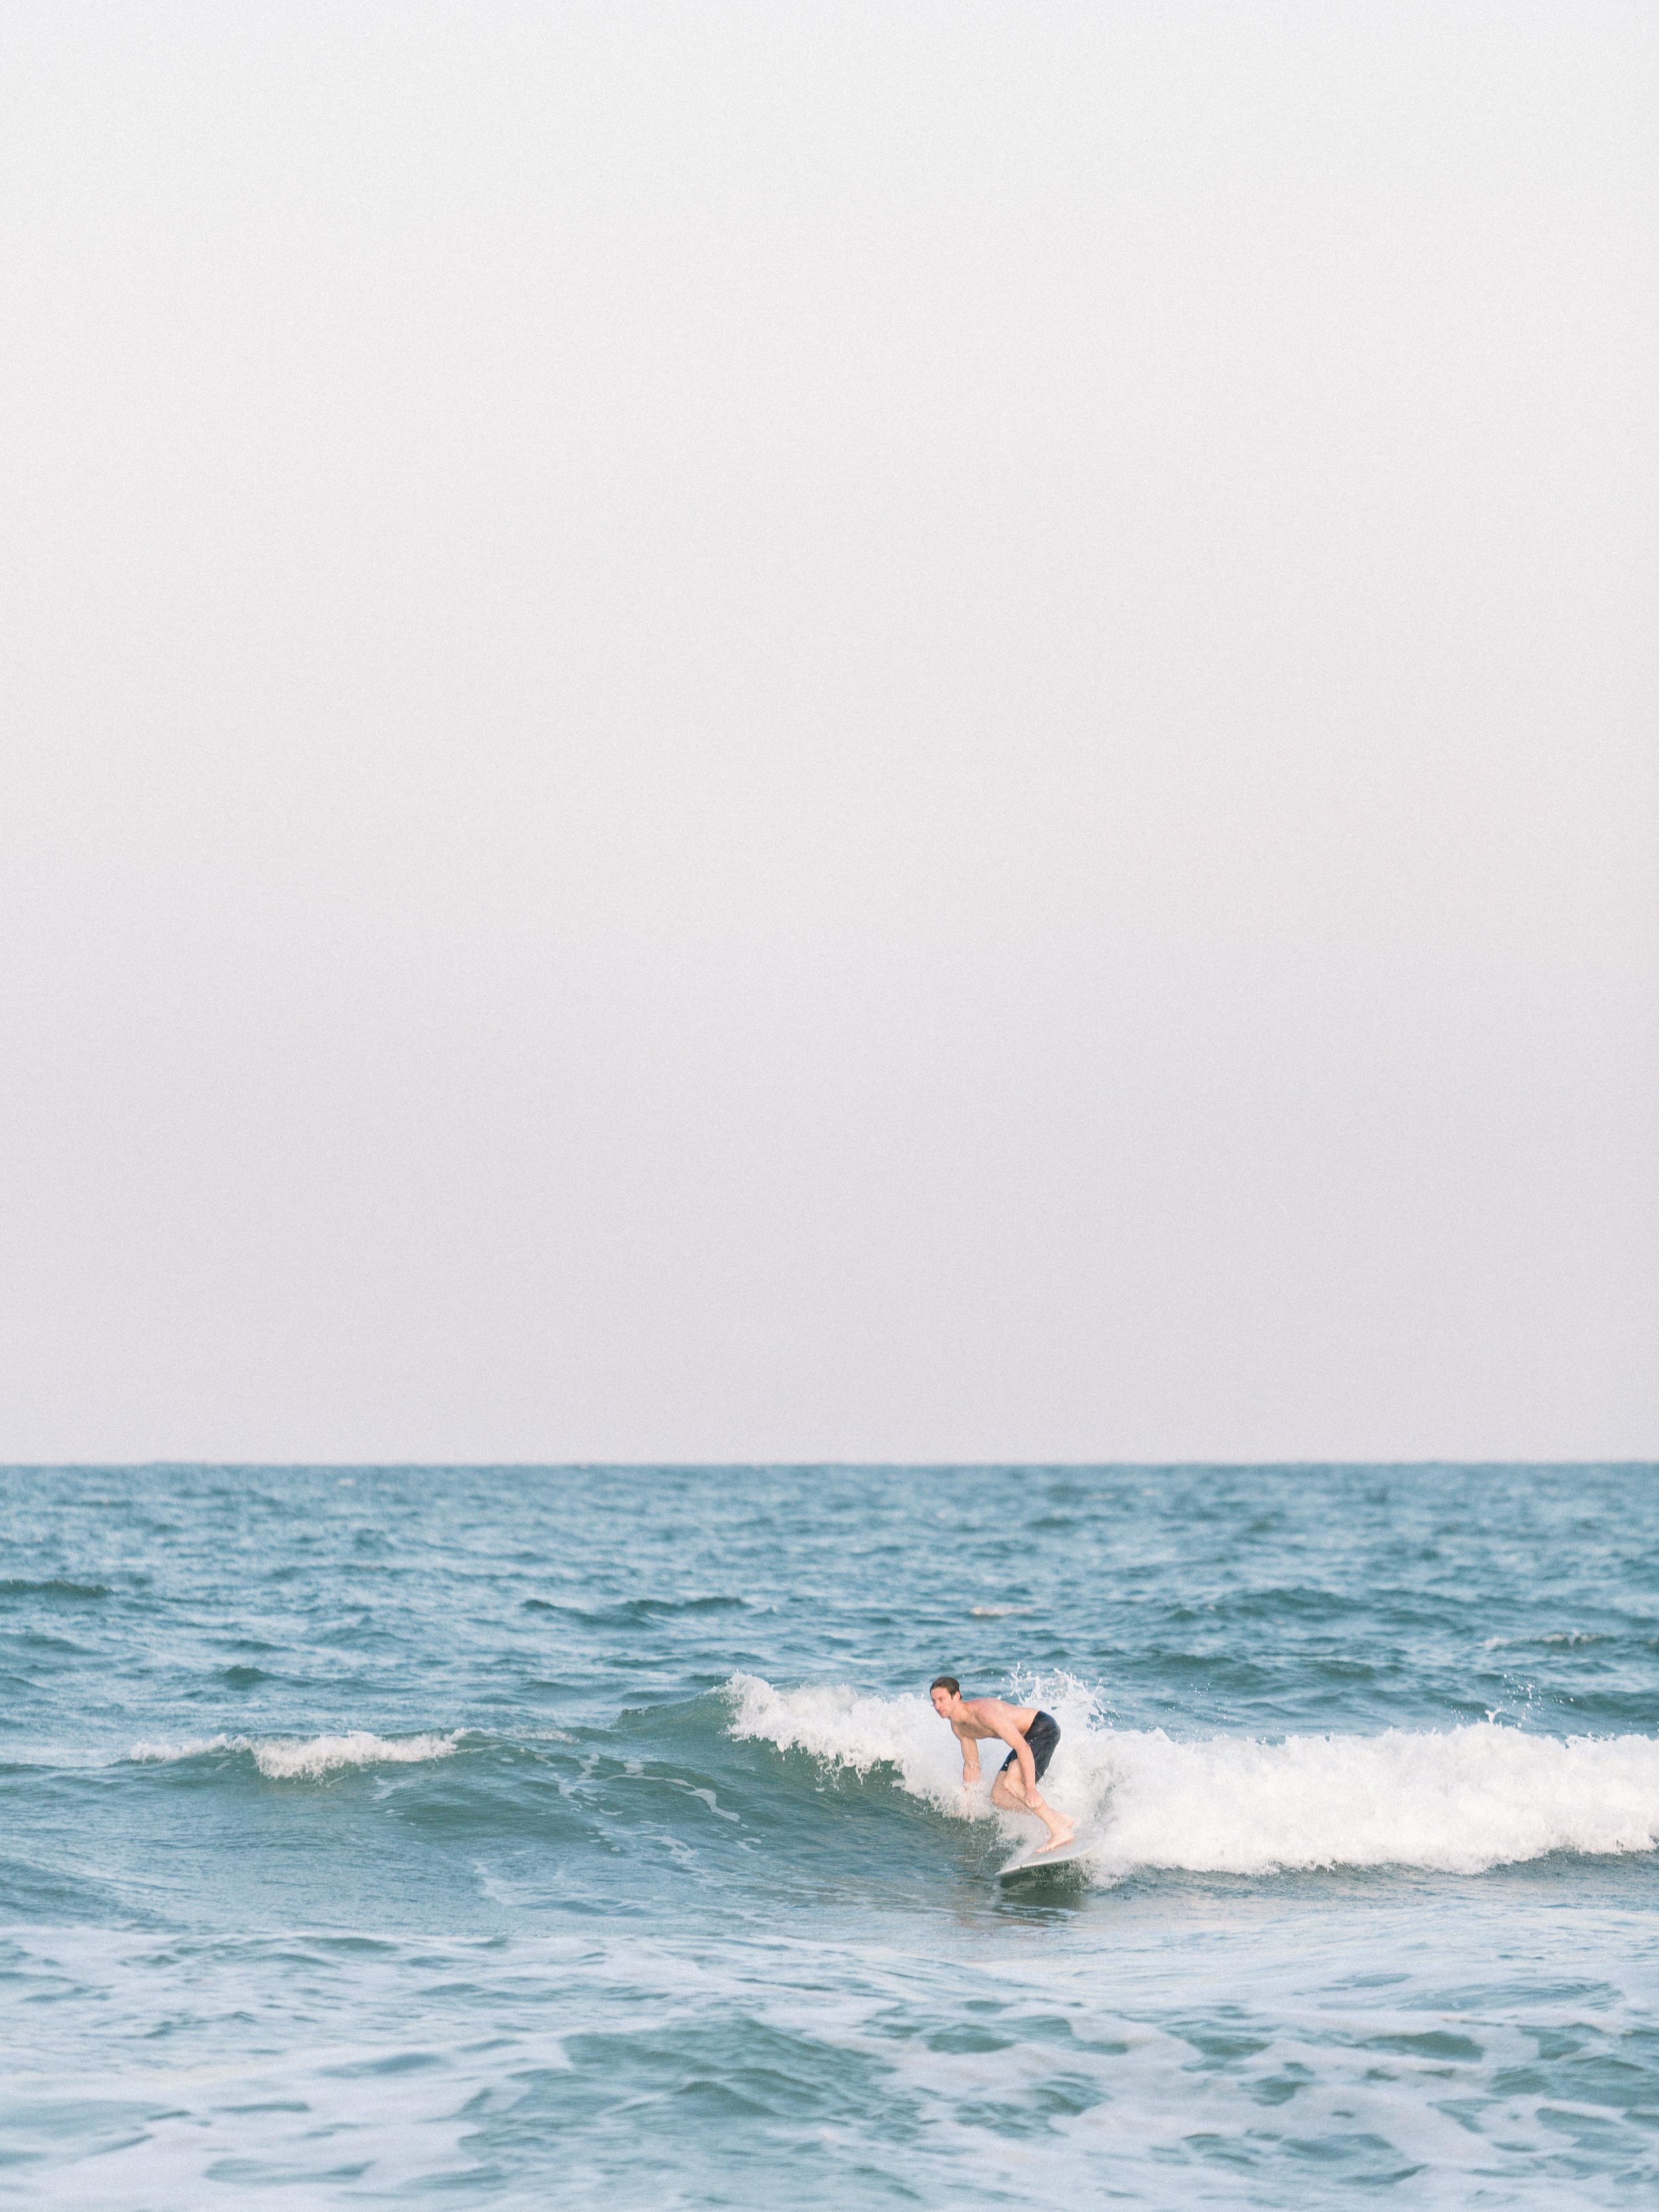 Surf-7.jpg